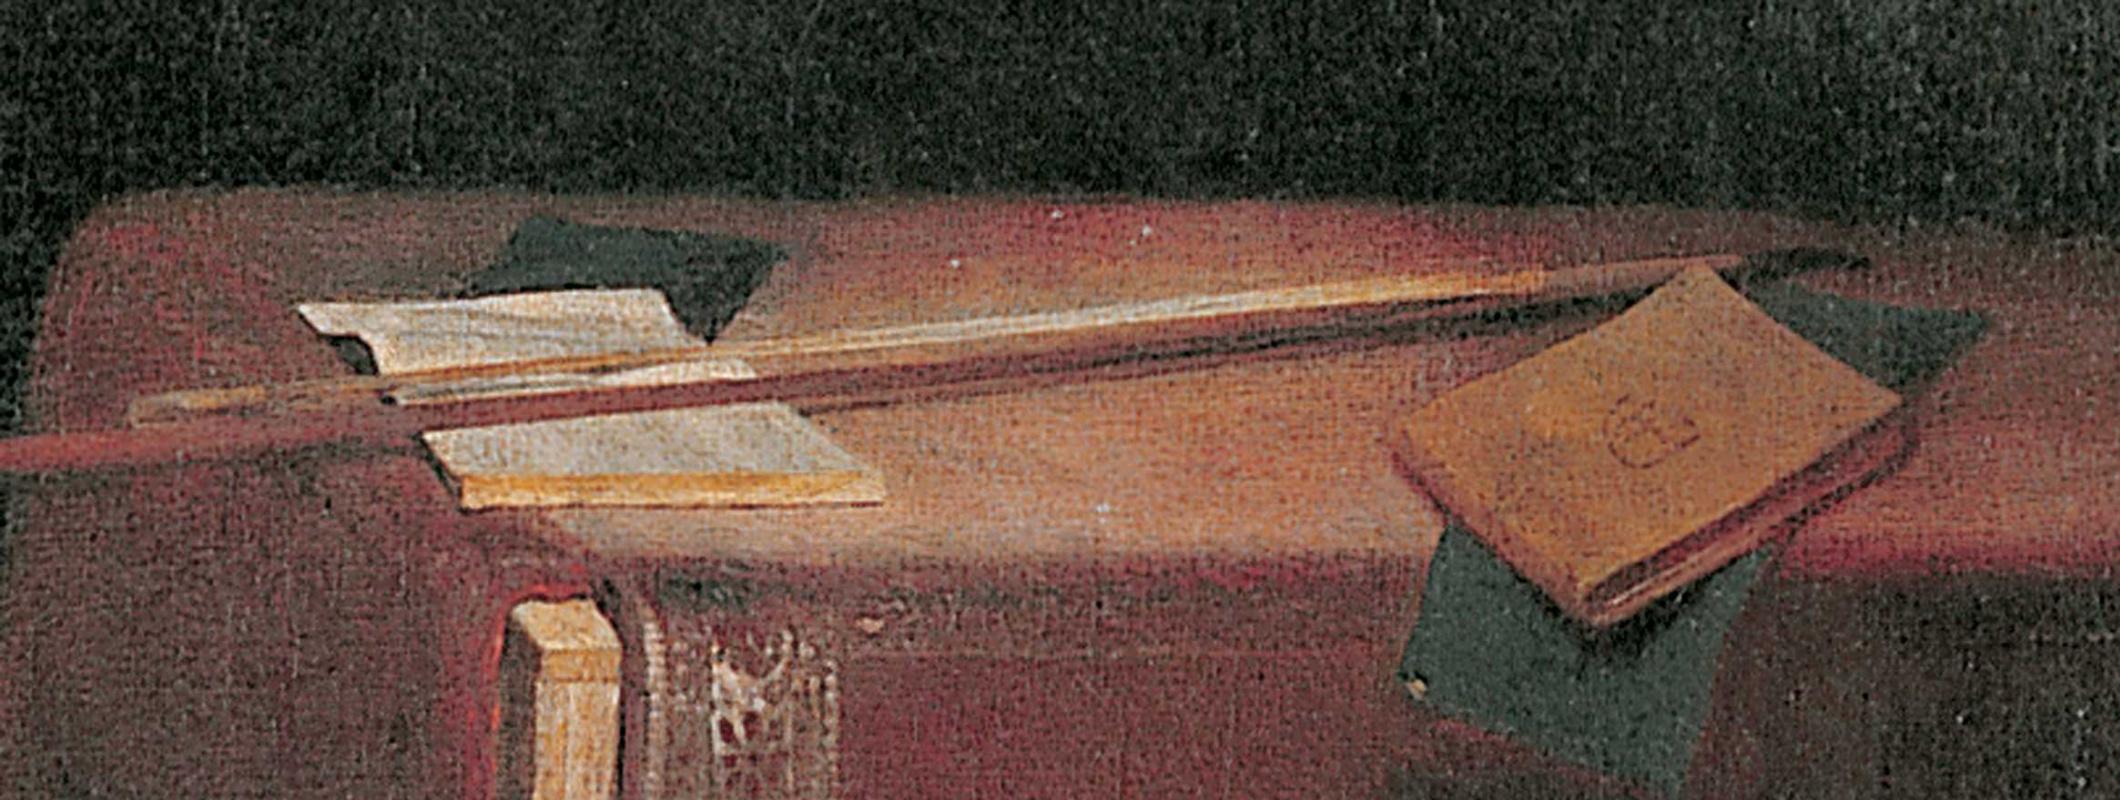 Герард Терборх. Урок музыки. Фрагмент